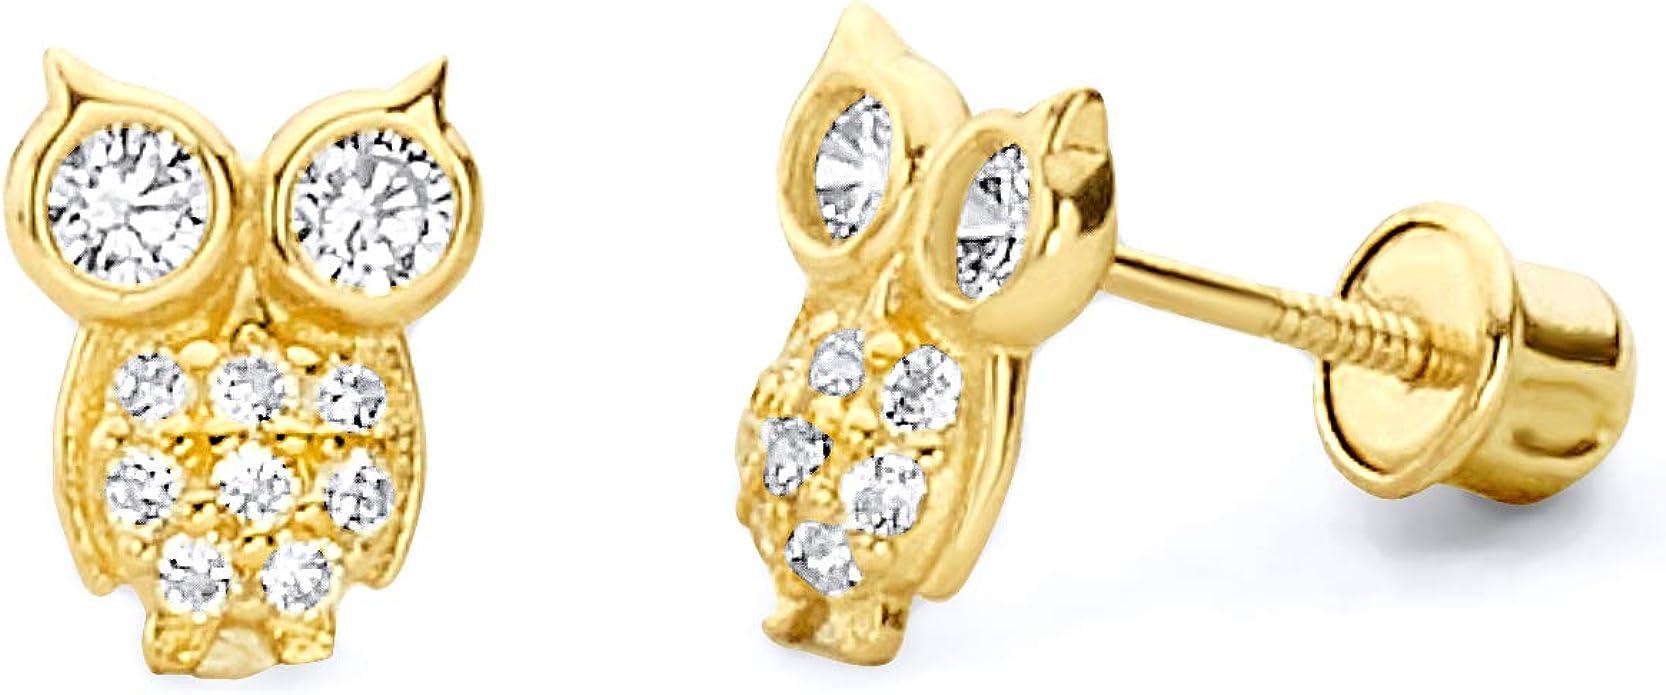 14K Yellow Gold Owl Stud Earrings